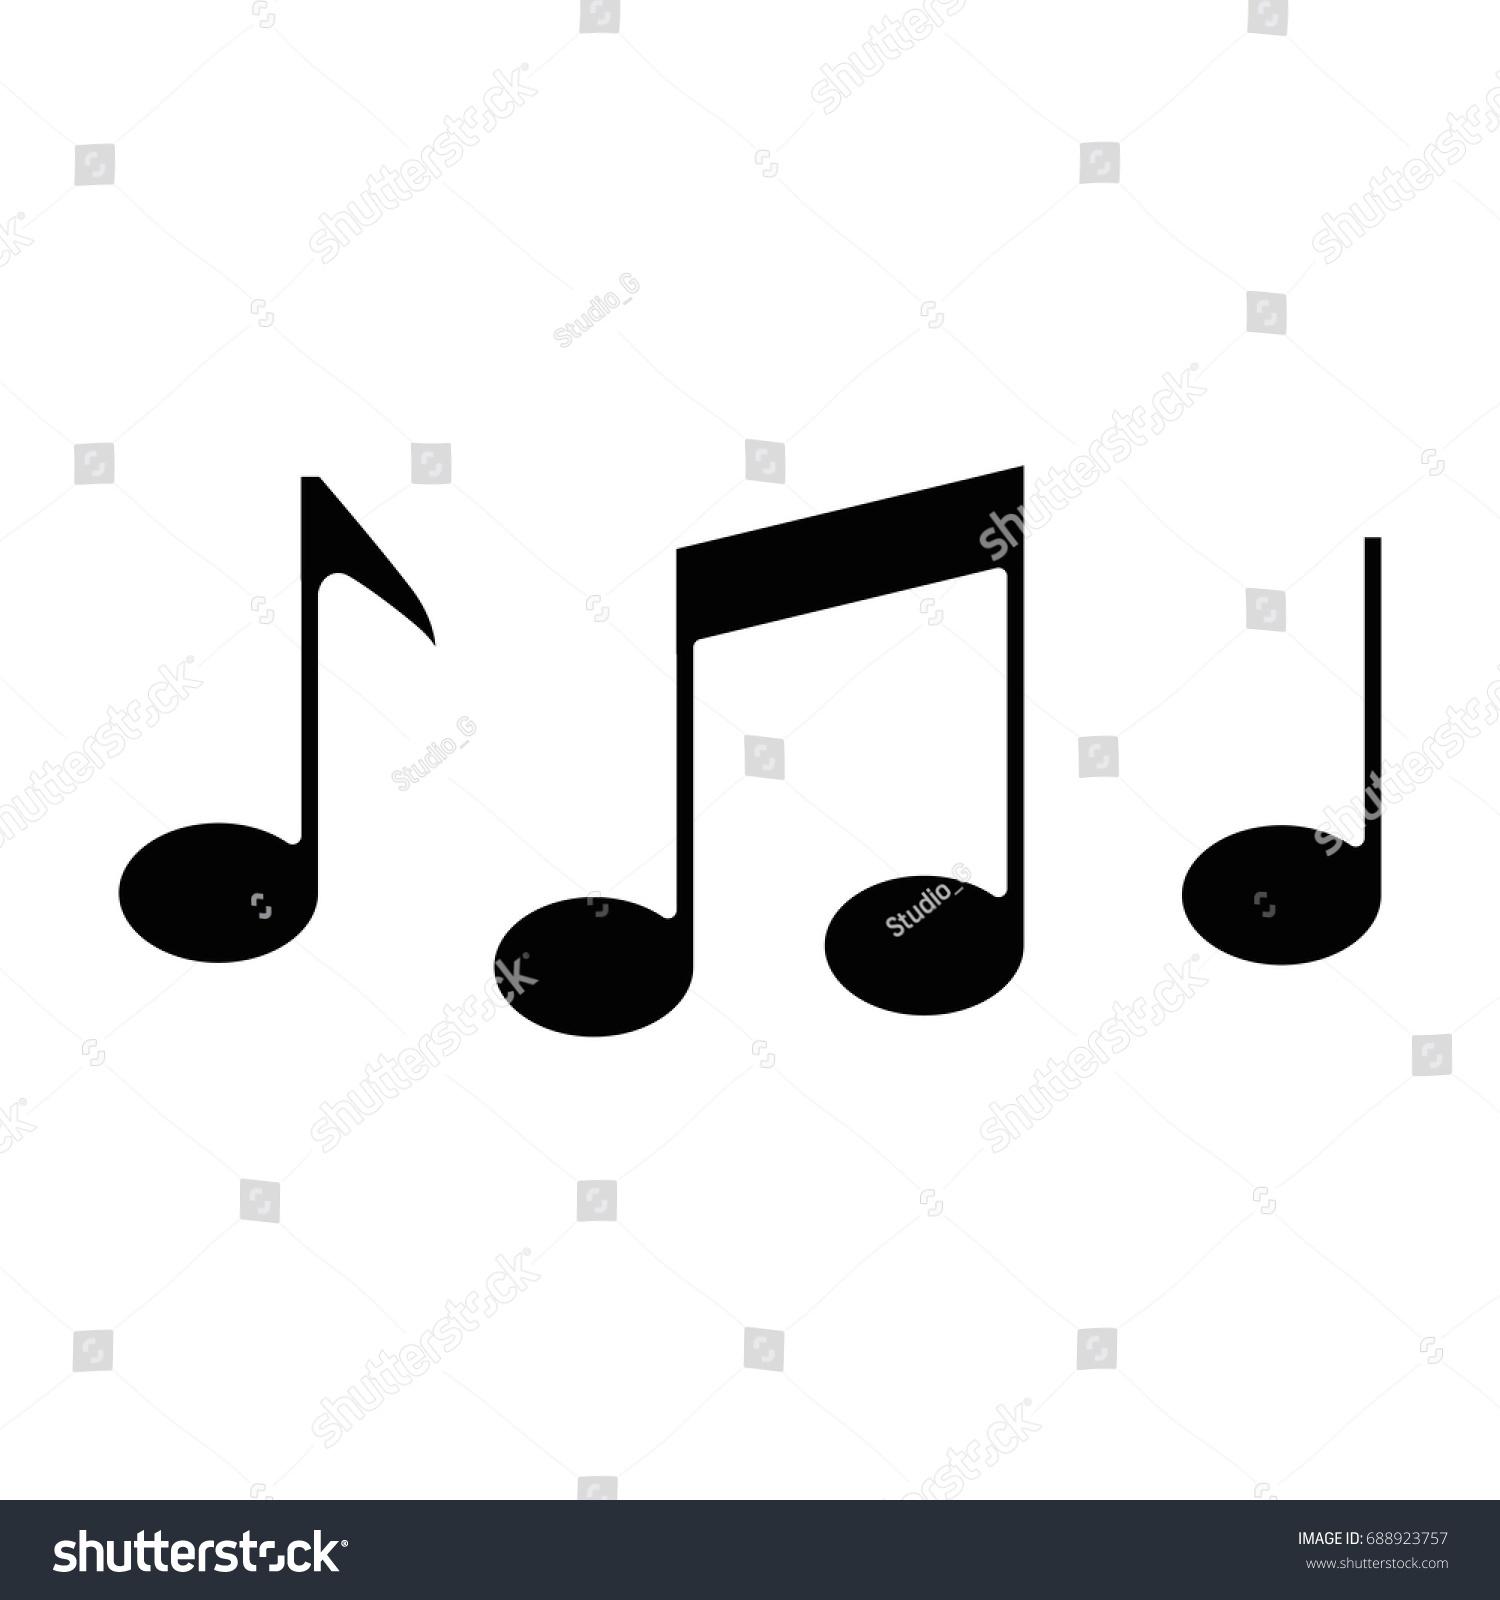 Music note symbol stock vector 688923757 shutterstock music note symbol biocorpaavc